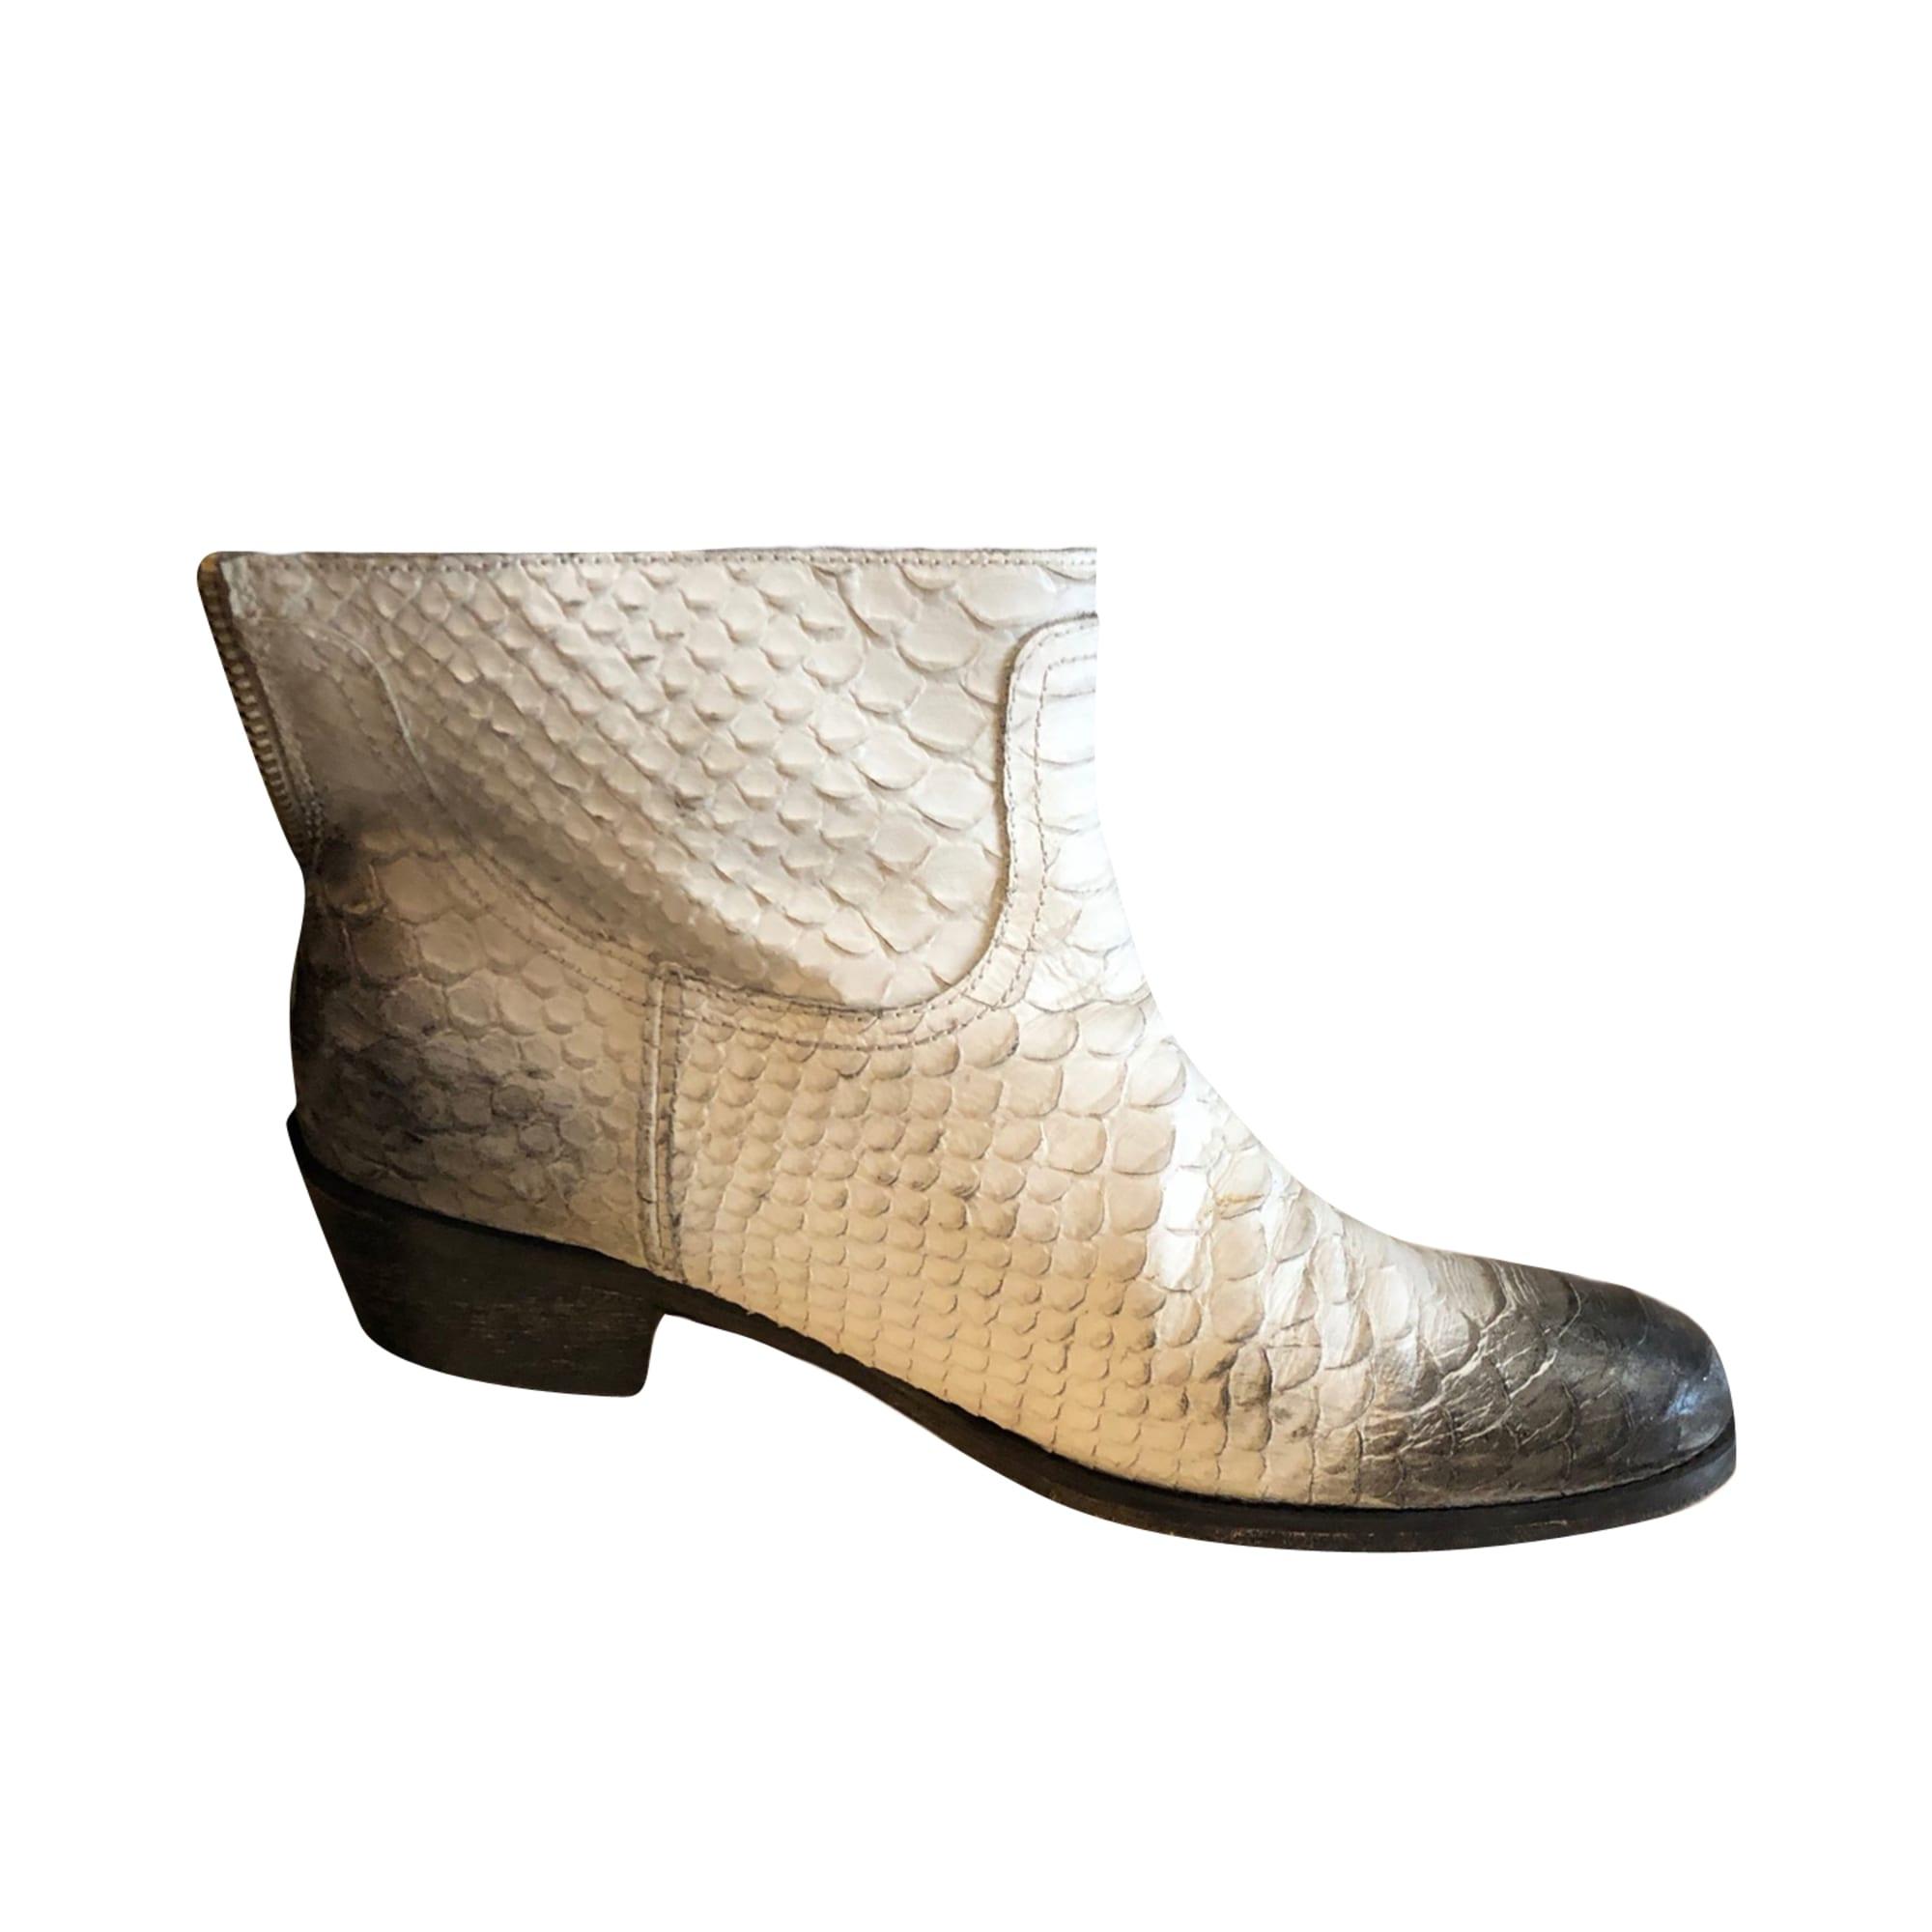 Stivali a punta, stivali cowboy ZADIG & VOLTAIRE Bianco, bianco sporco, ecru